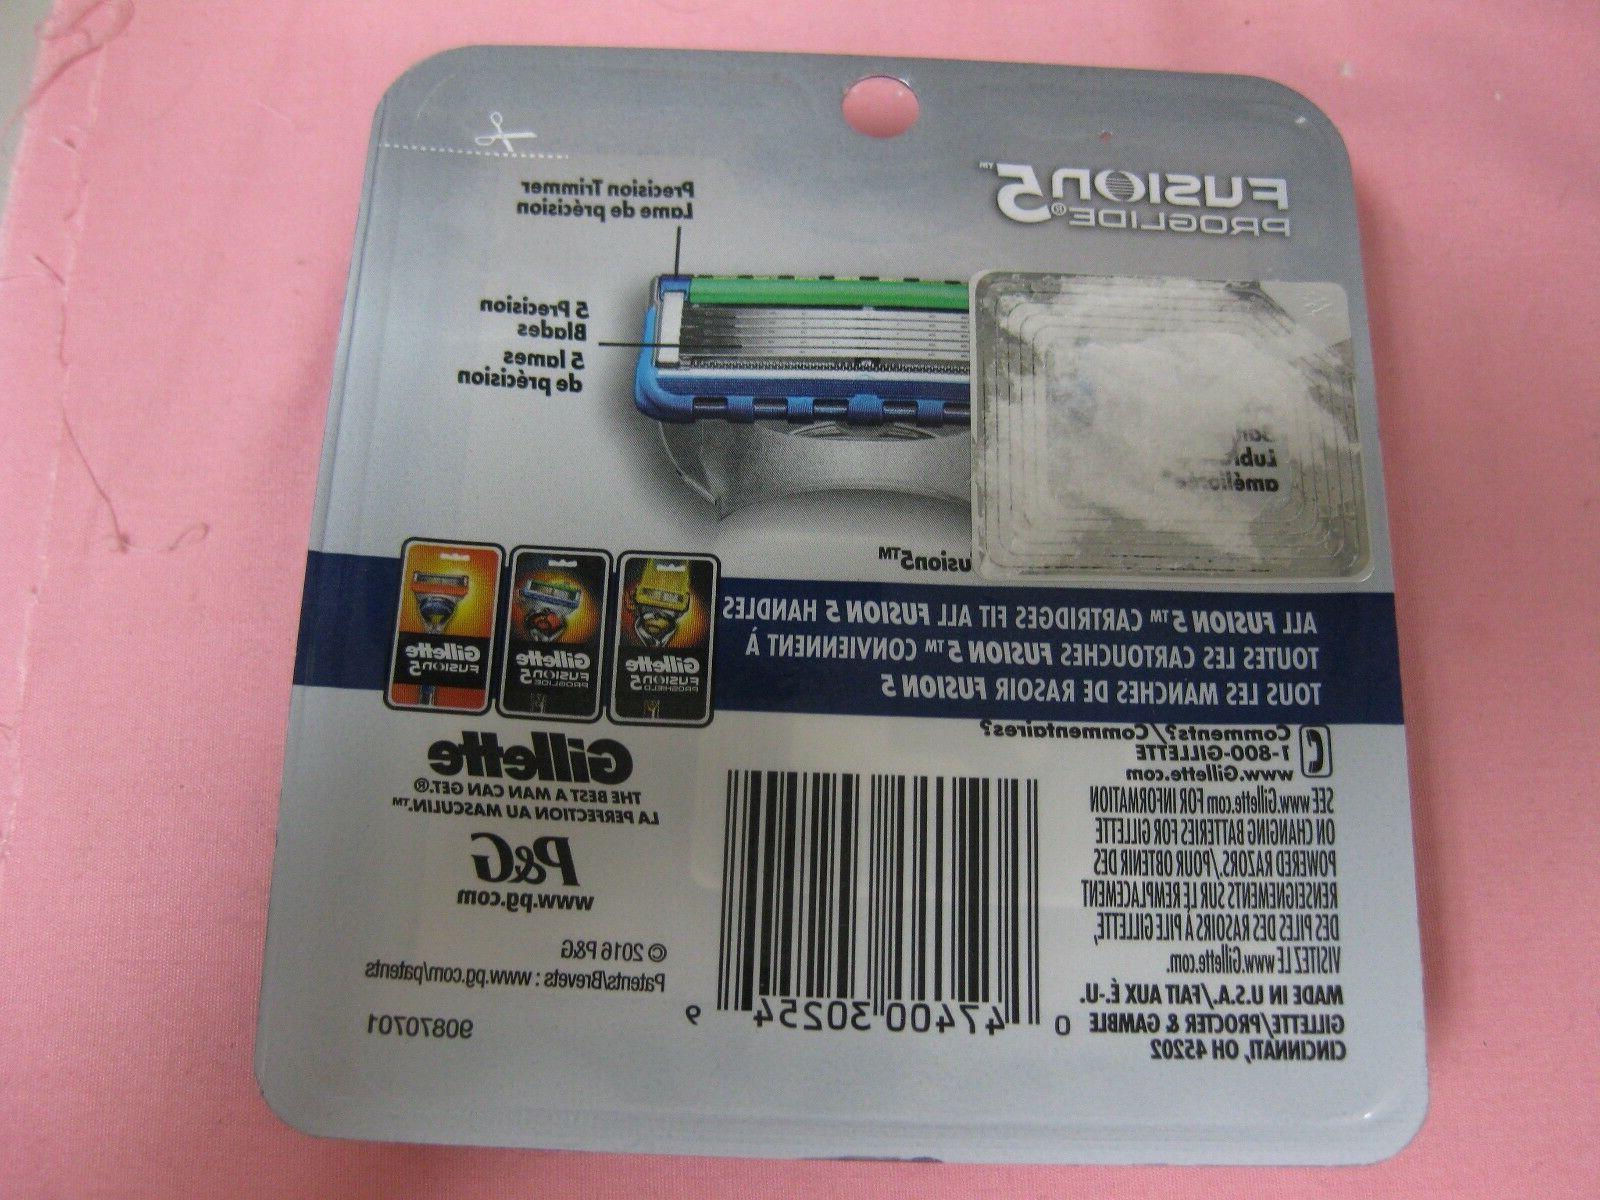 Gillette 5 Razor Cartridges, 100% Authentic!!!